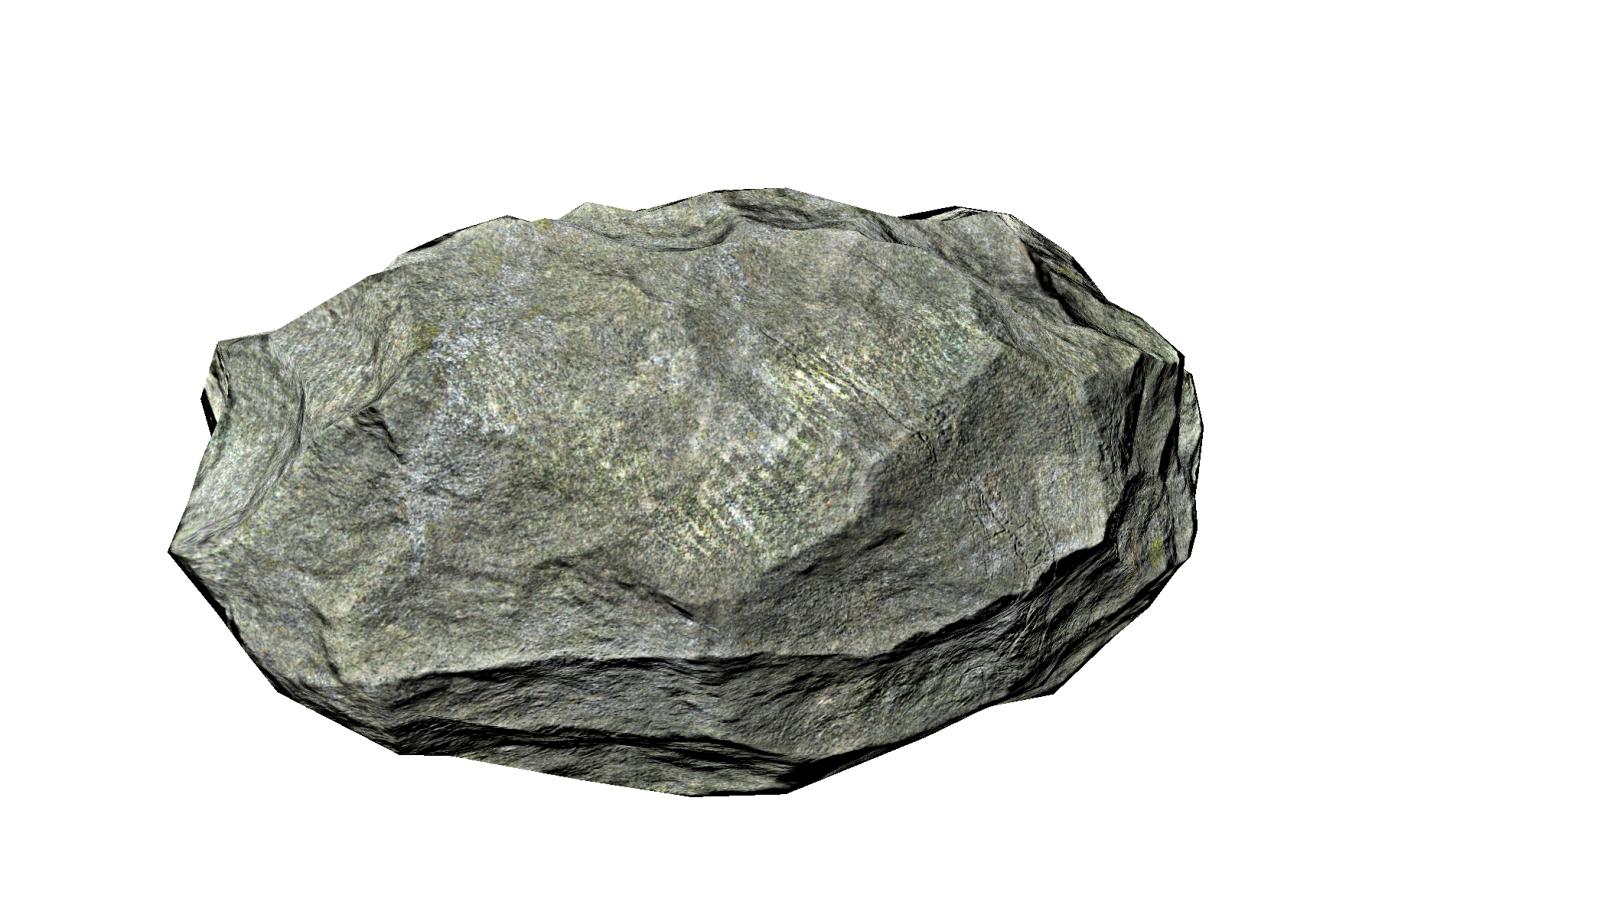 Rock Png Photoshop Resources Photoshop Rock Textures